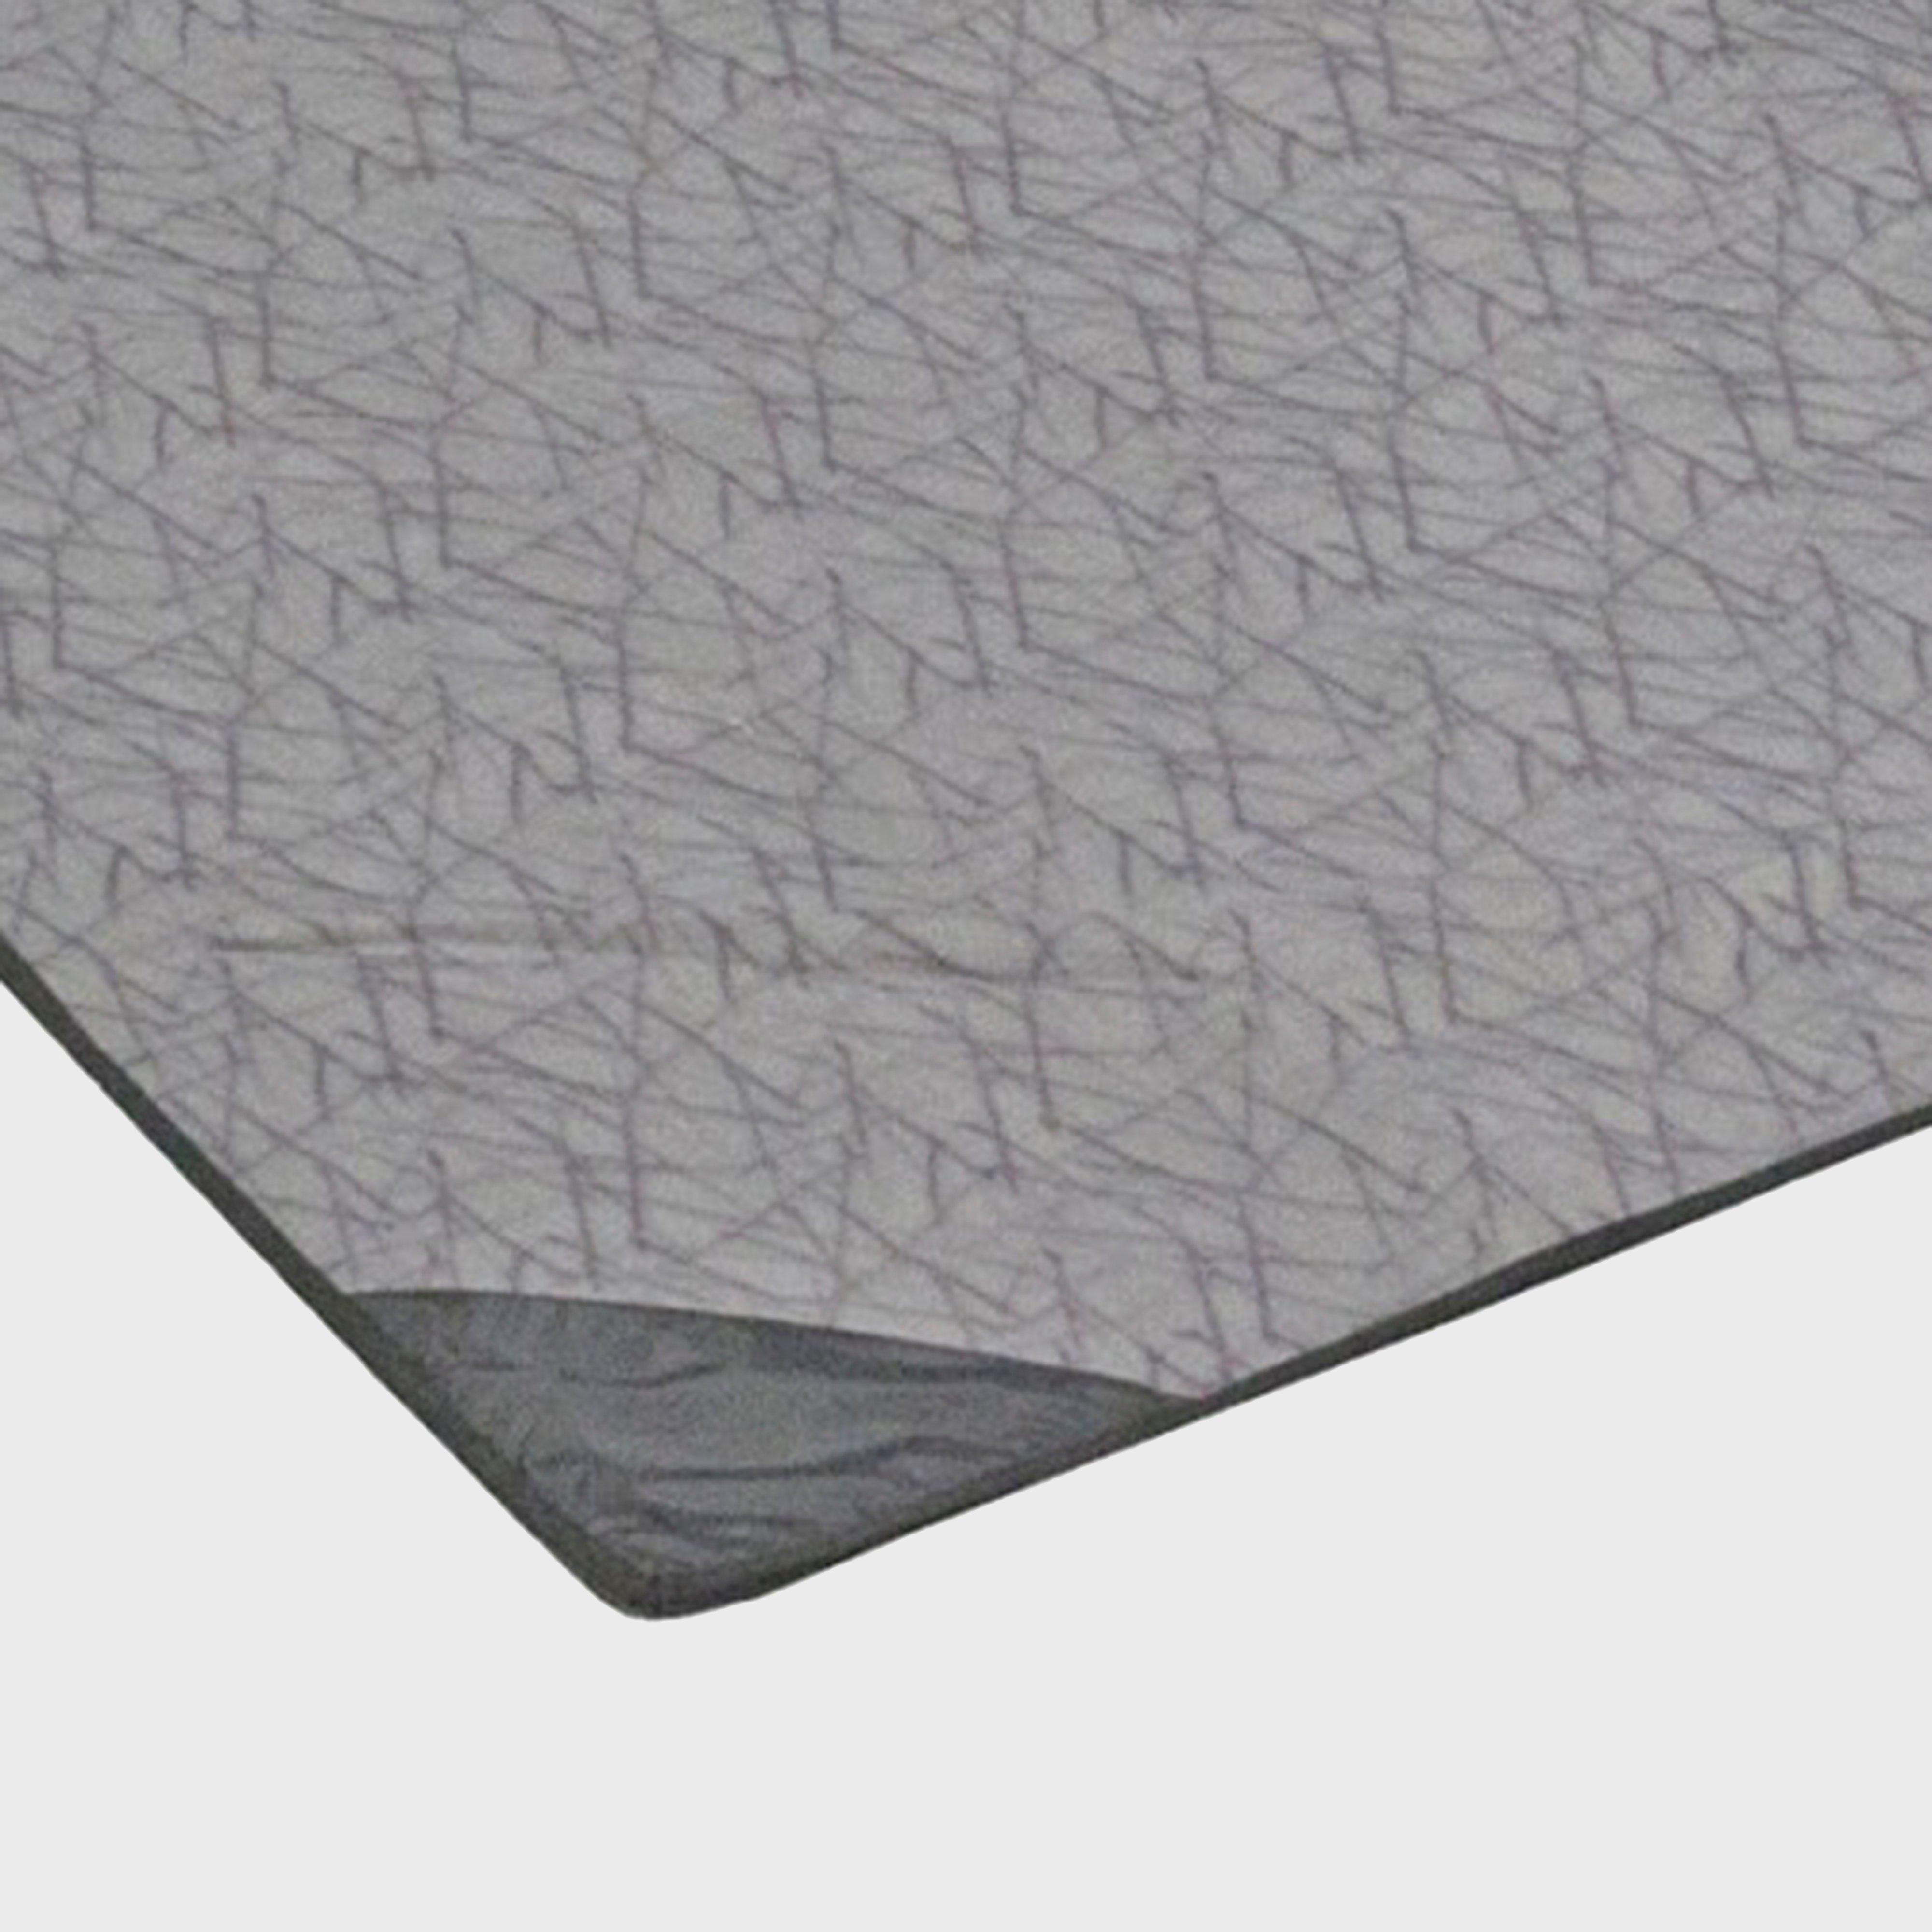 Vango Vango Casa 7 Tent Carpet - Grey, Grey